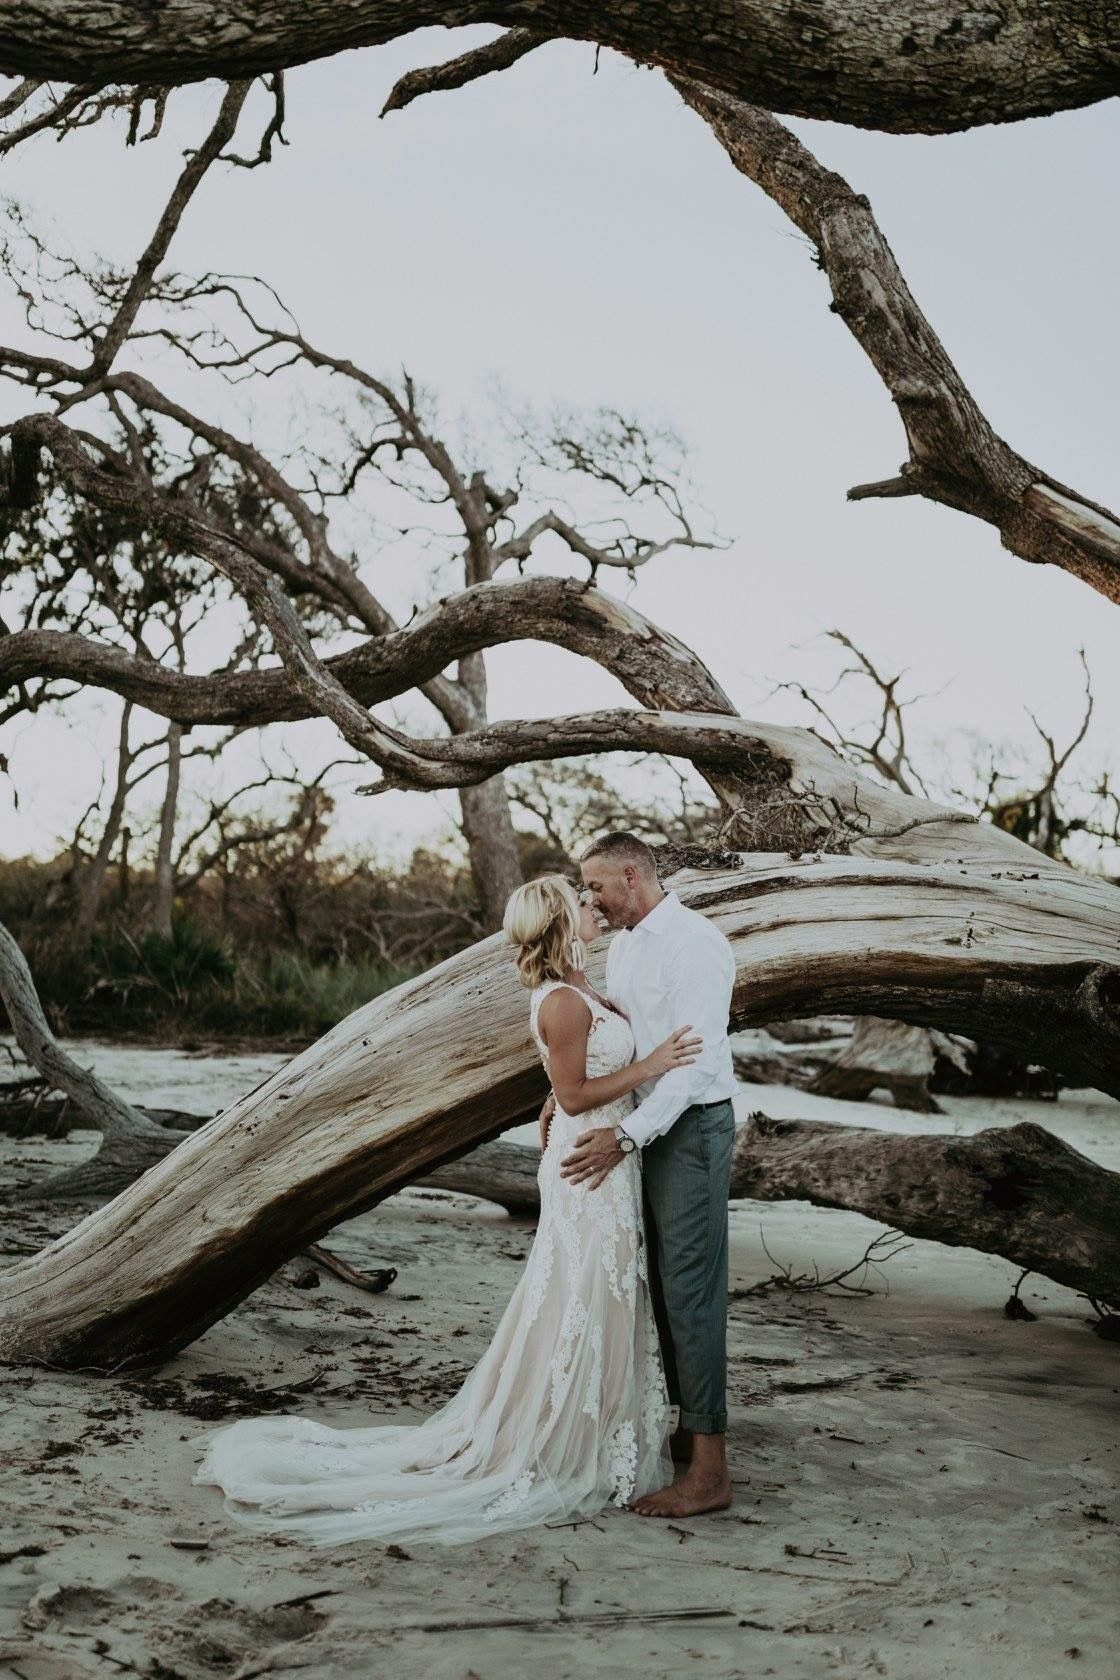 Jekyll Island Driftwood Beach Wedding Elopement Wedding Venues Beach Beach Wedding Locations Beach Wedding Photos